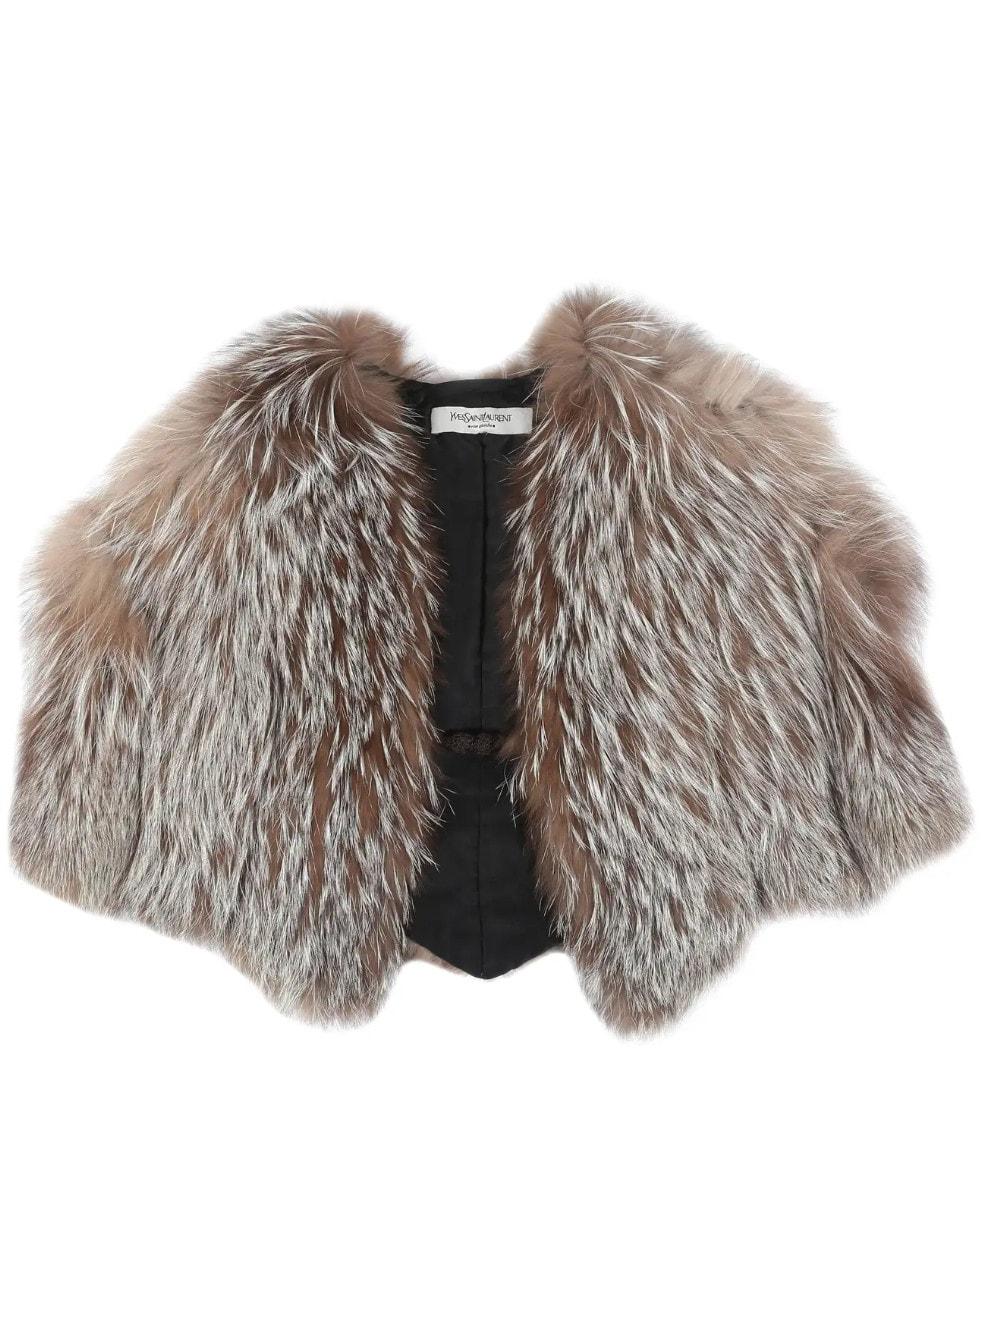 Alber Elbaz for Yves Saint Laurent Autumn-Winter 1999 fox fur capelet